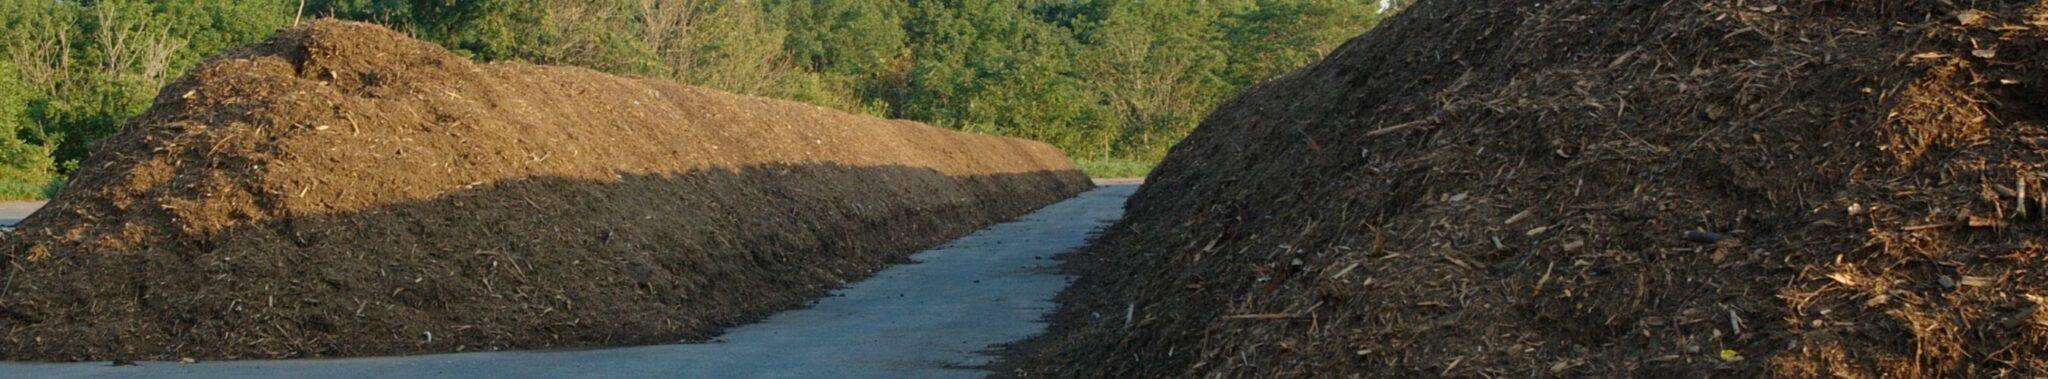 huge pile of bulk organic mulch